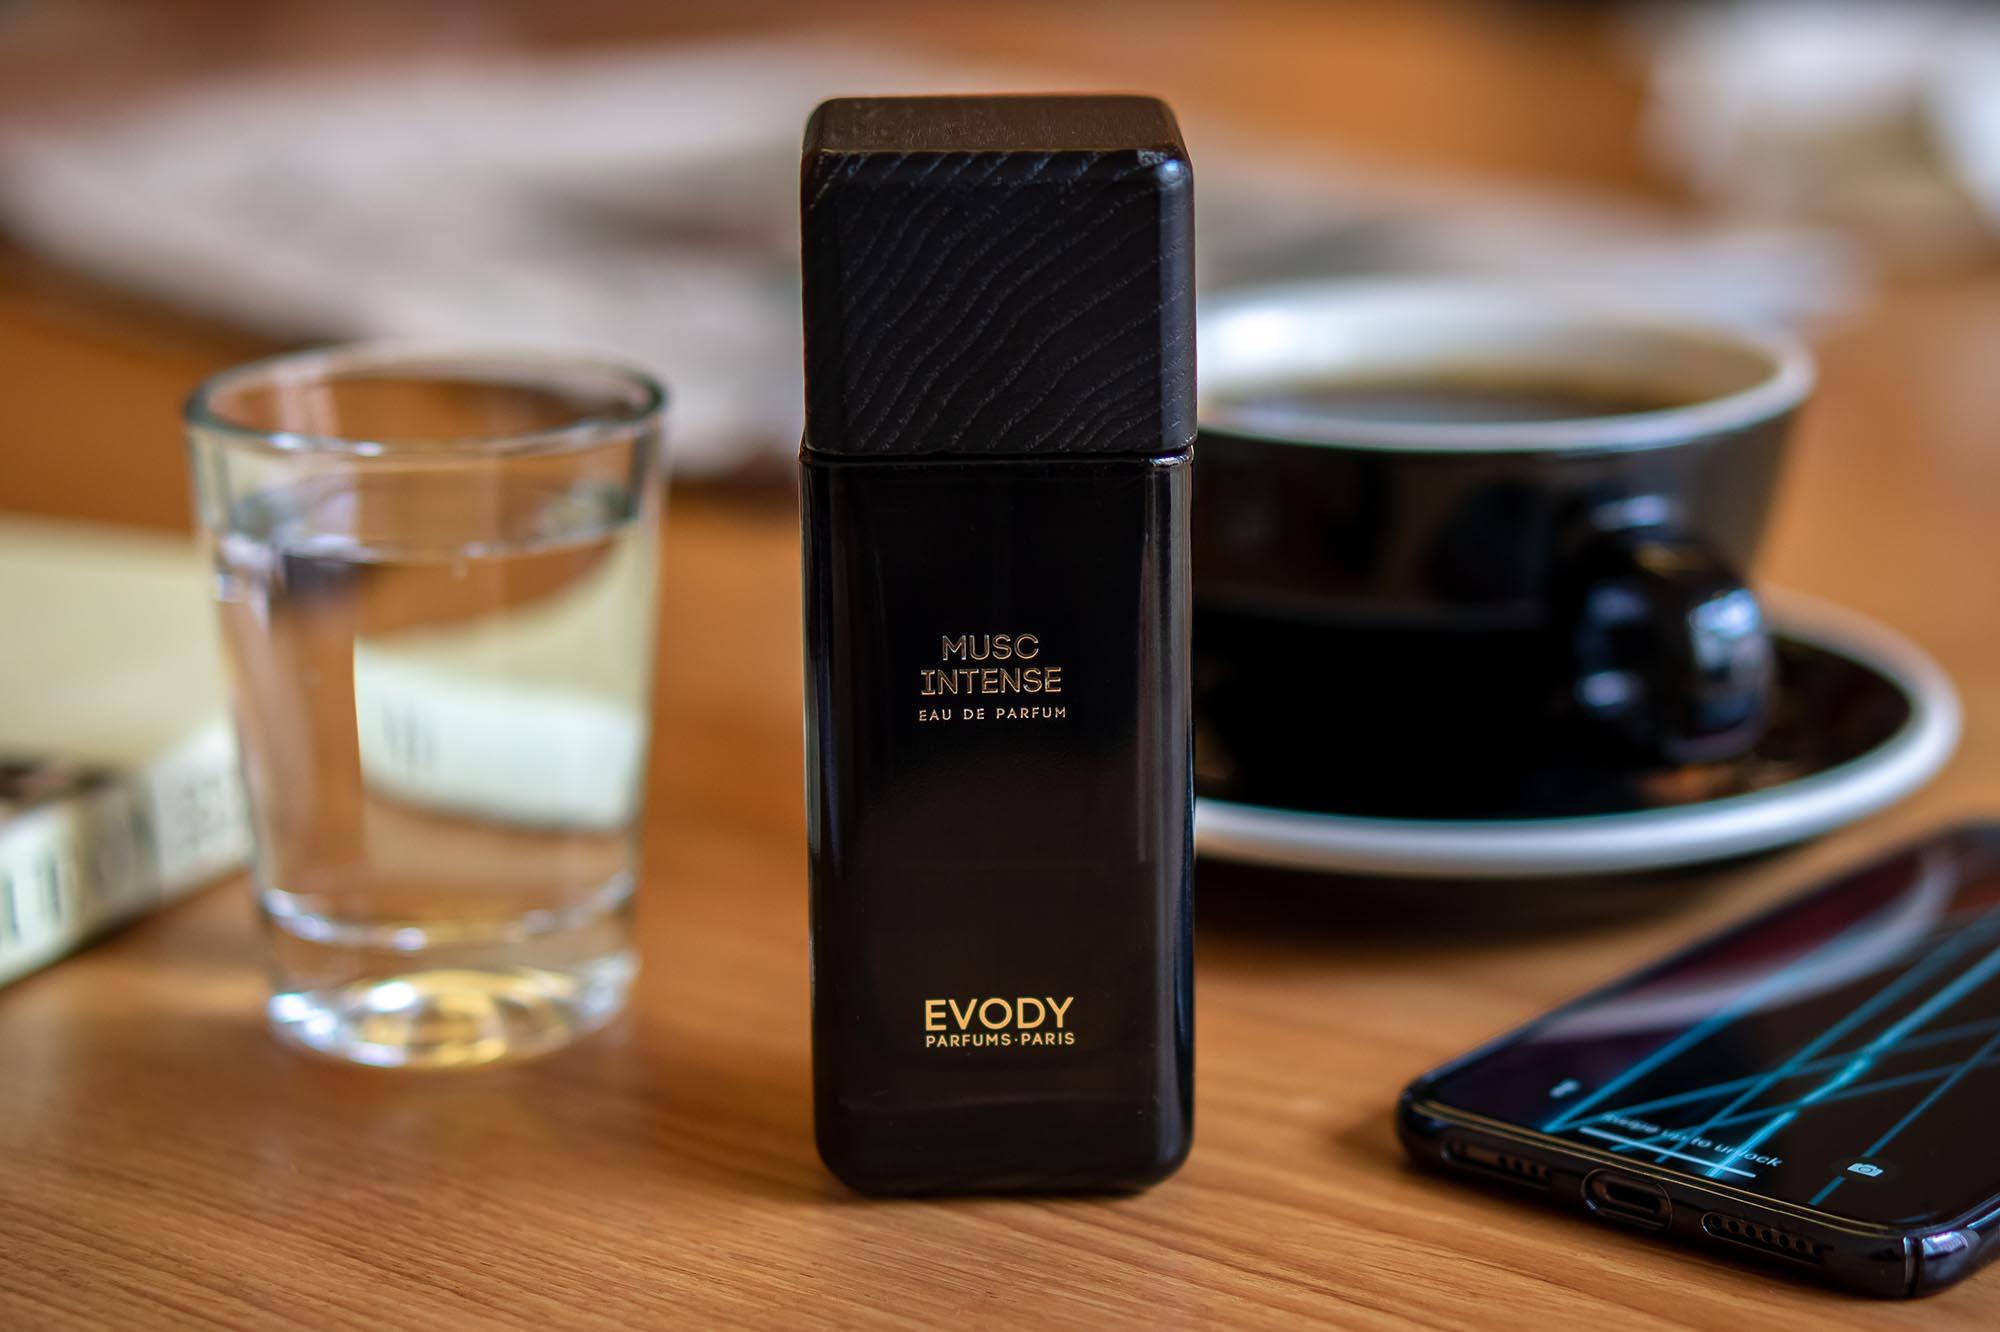 Evody Musc Intense perfume niche fragrance parfüm парфюм